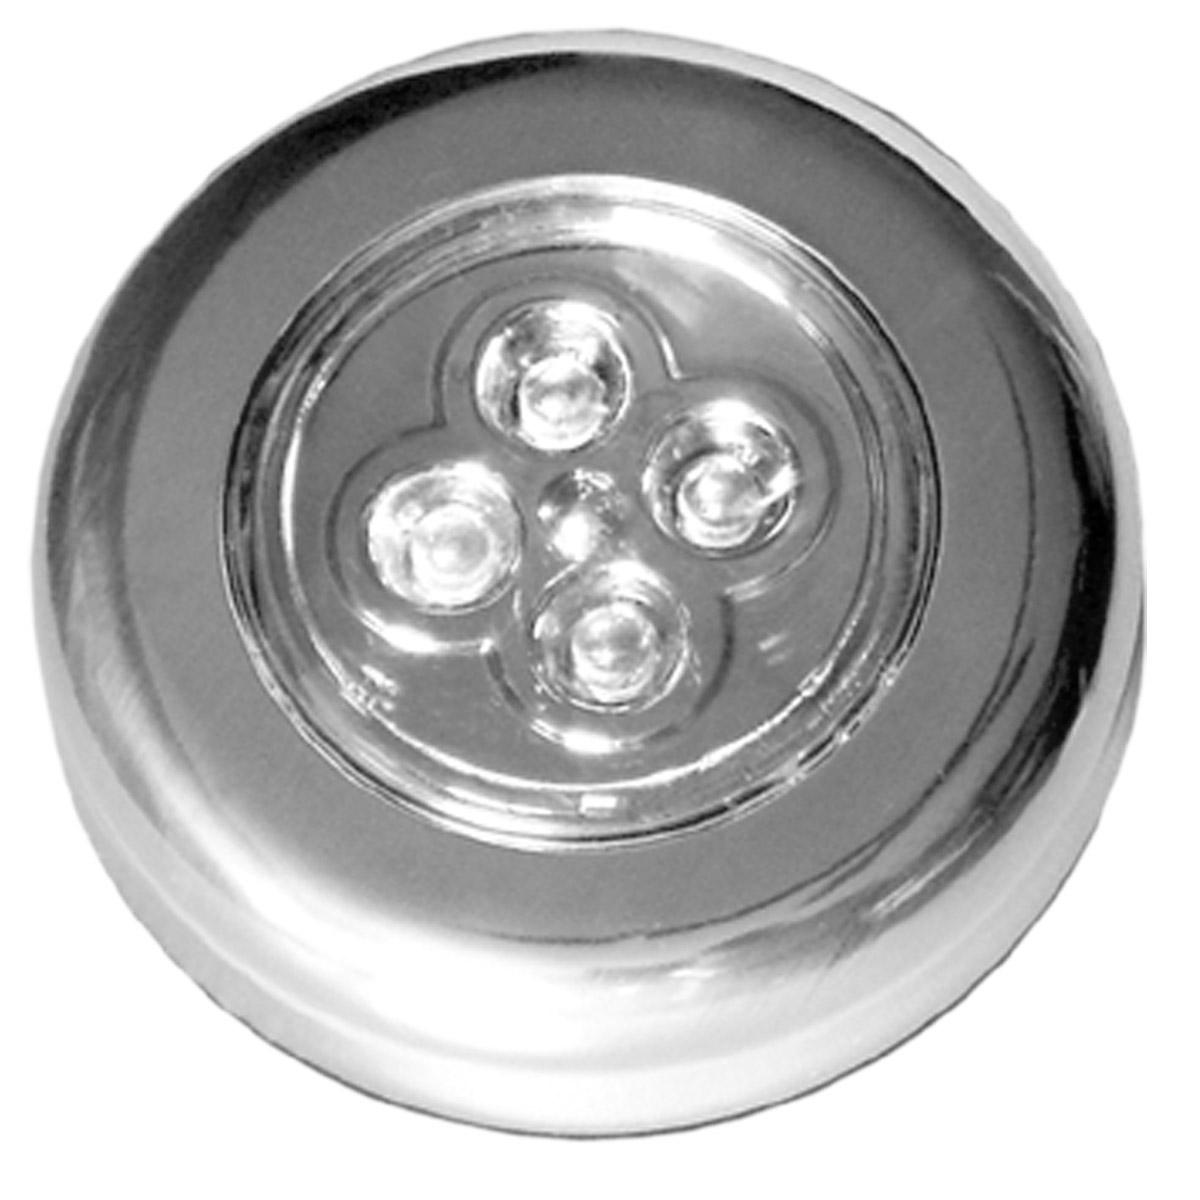 CSR0154 - Lanterna para Armário 4 LEDs CSR 0154 CSR